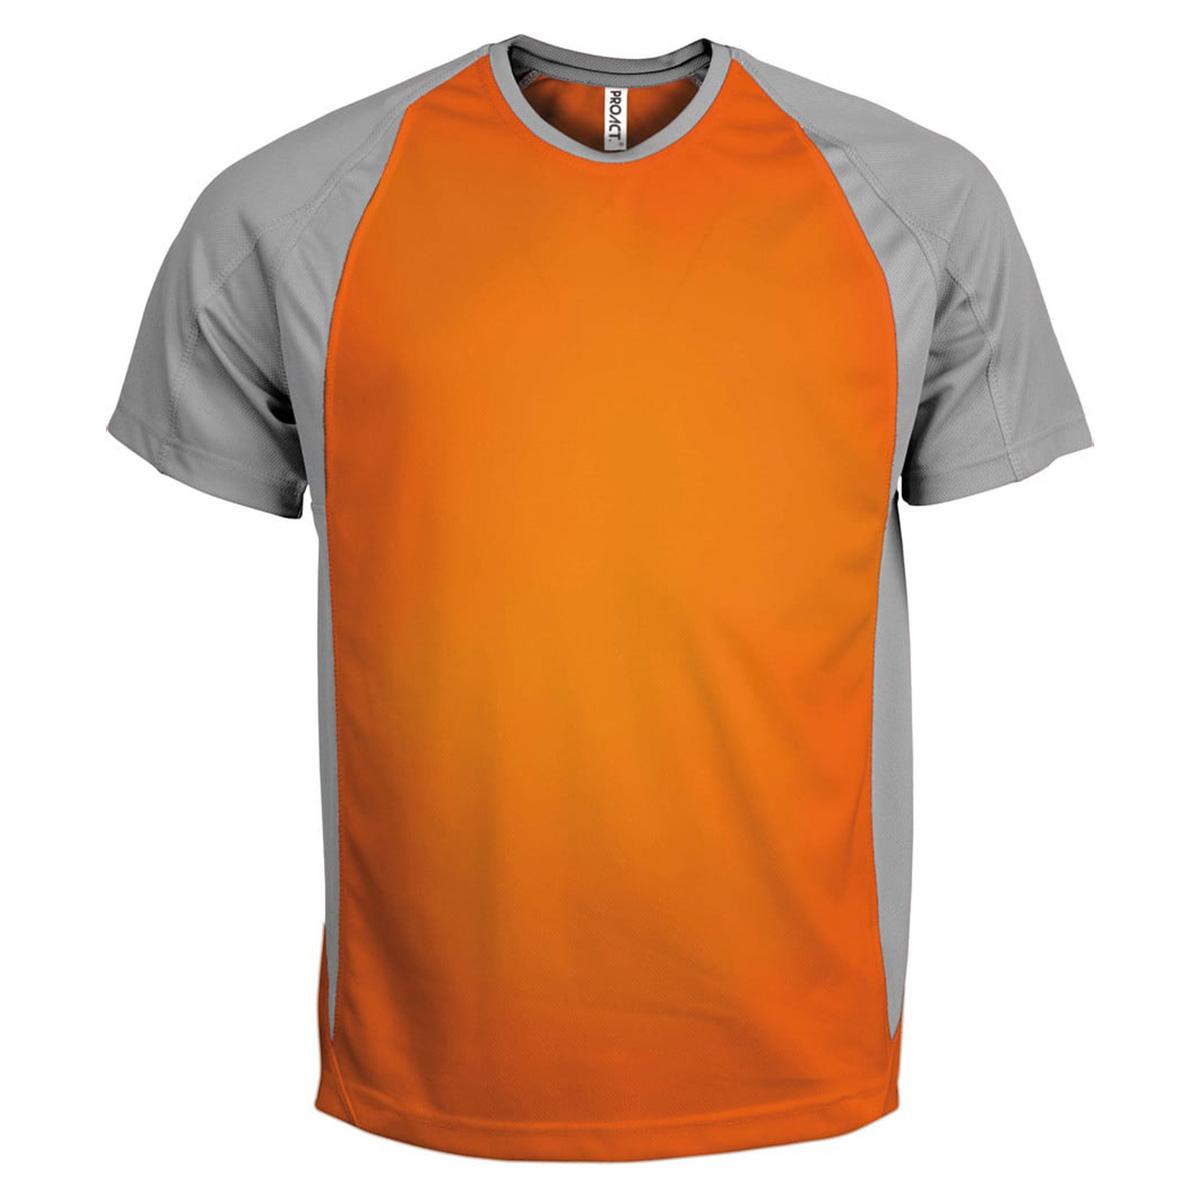 D01_pa467_orange_grey--0-0--11b4641e-df44-4d27-9e56-688fe520cc79